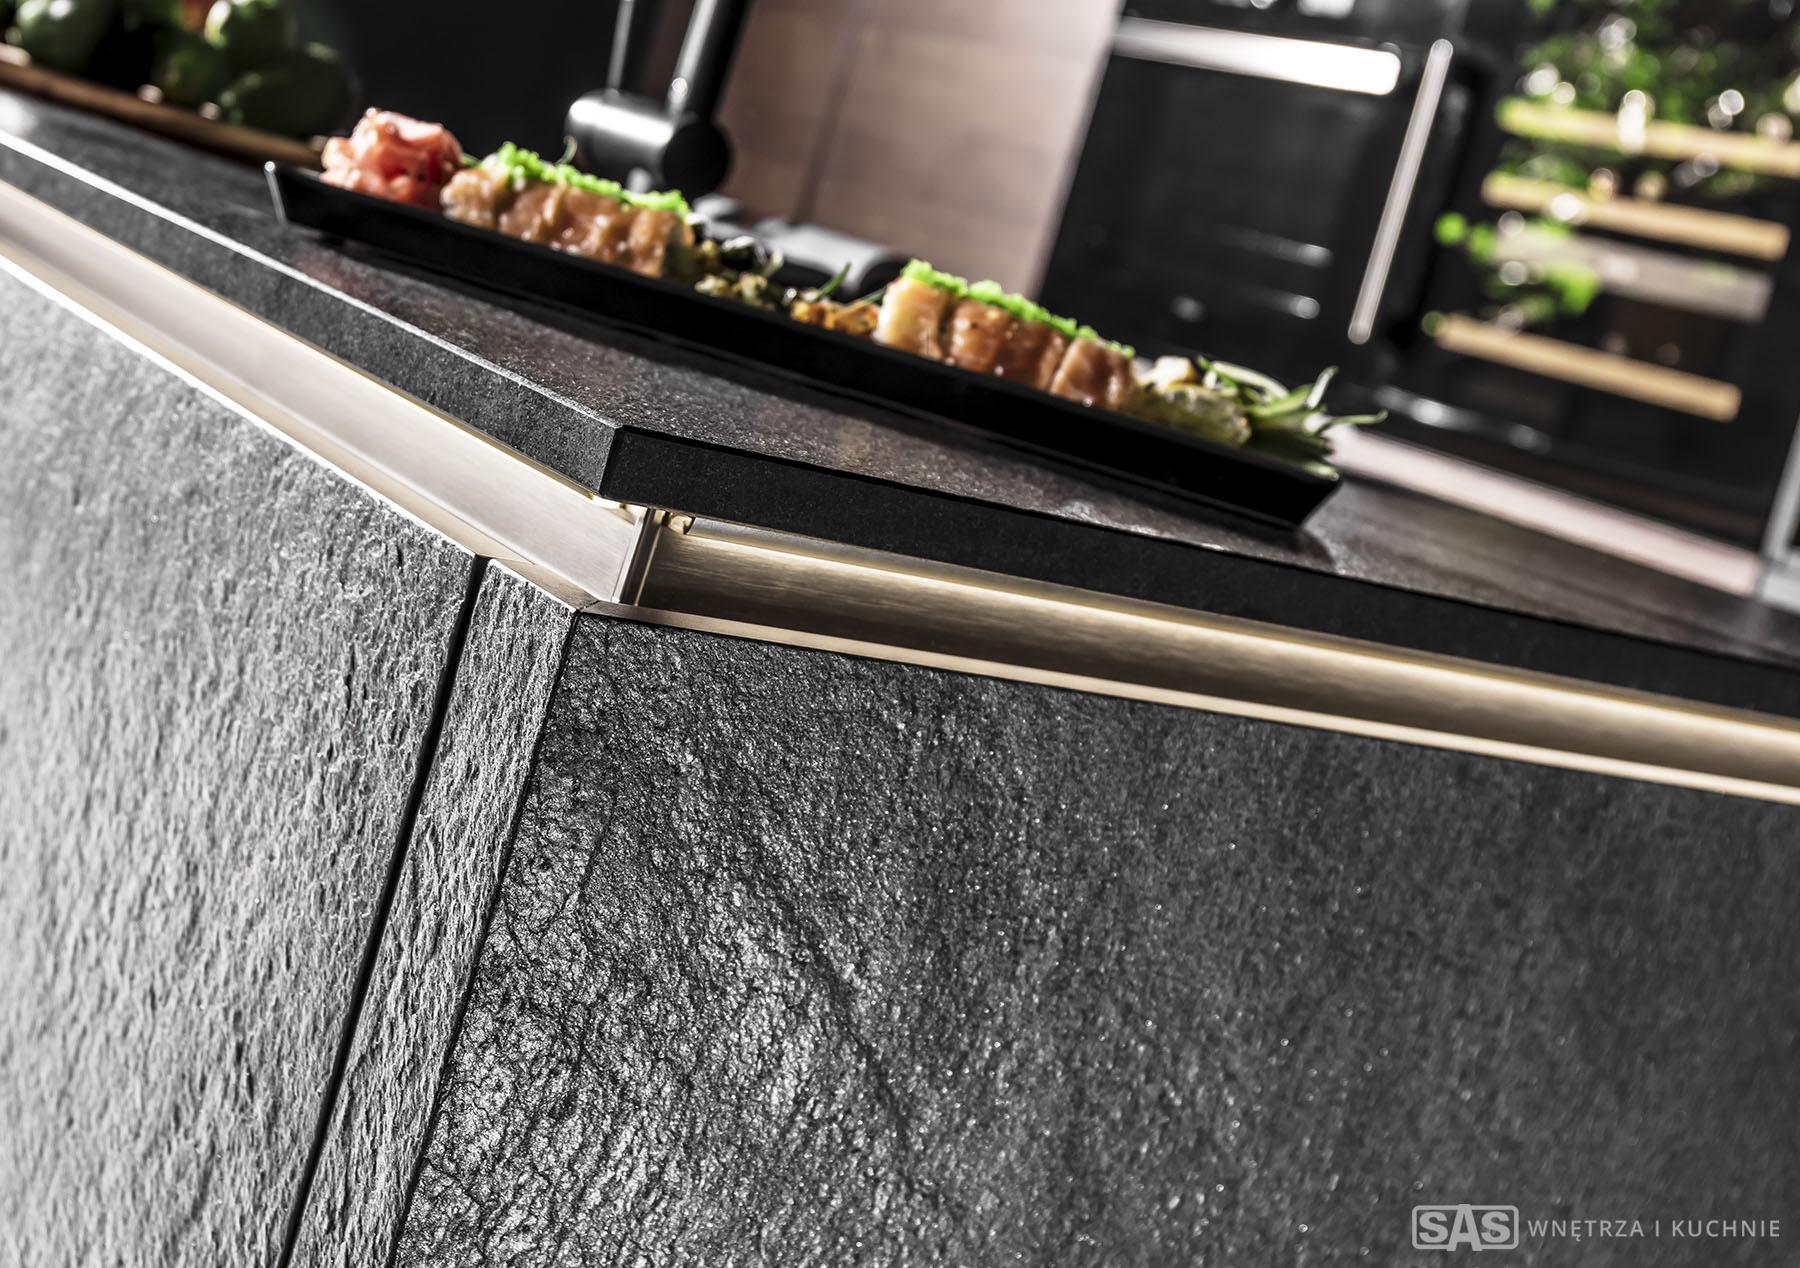 Meble kuchenne Black Star - granitowe fronty - meble kuchenne SAS Wnętrza i Kuchnia, projekt architekt wnętrz Emilia Strzempek Plasun.